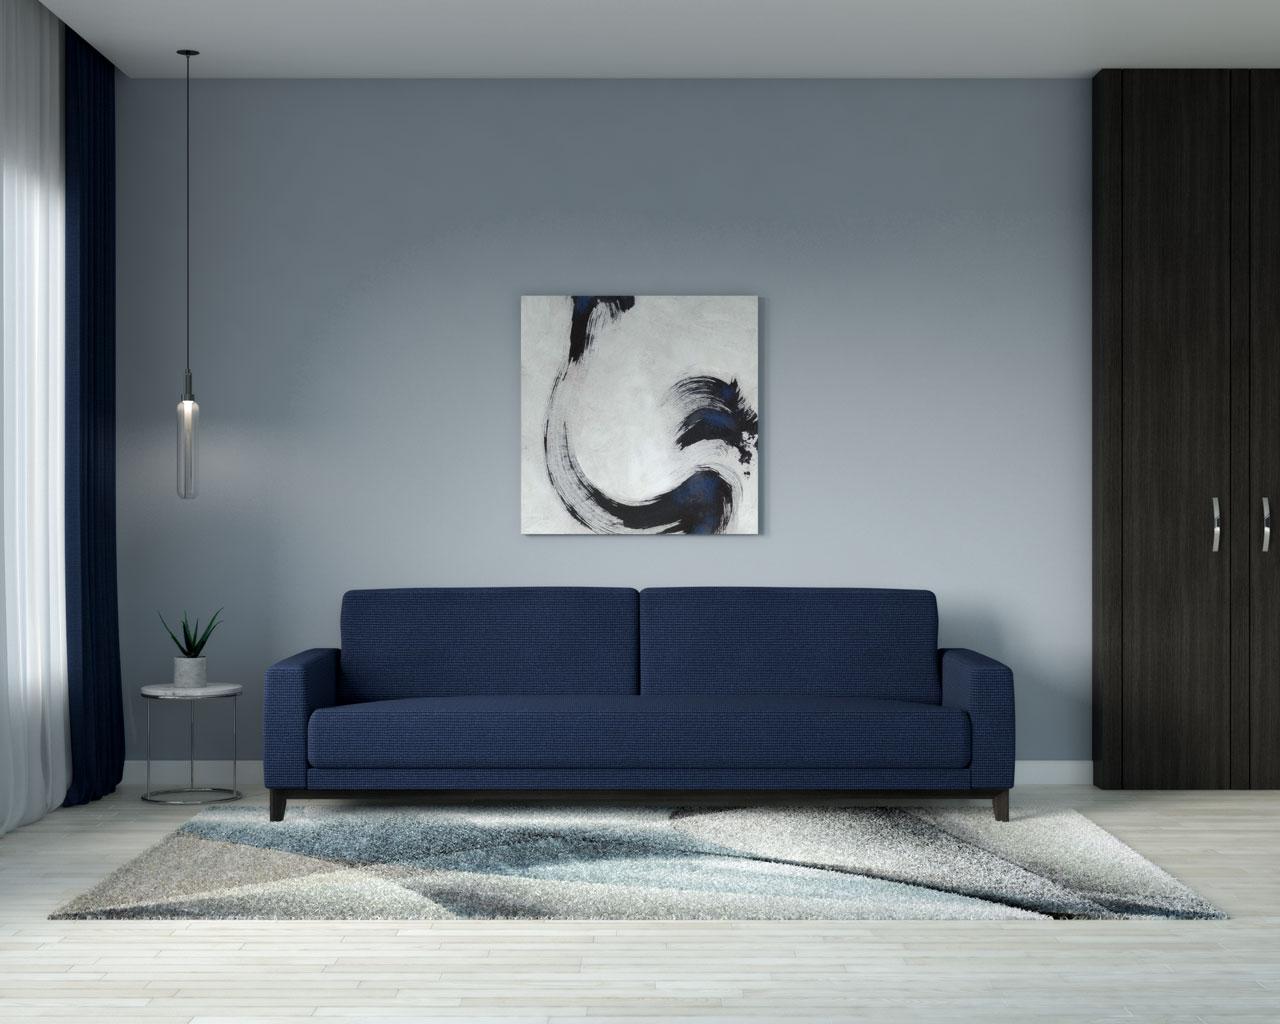 Graysih blue wall with navy sofa